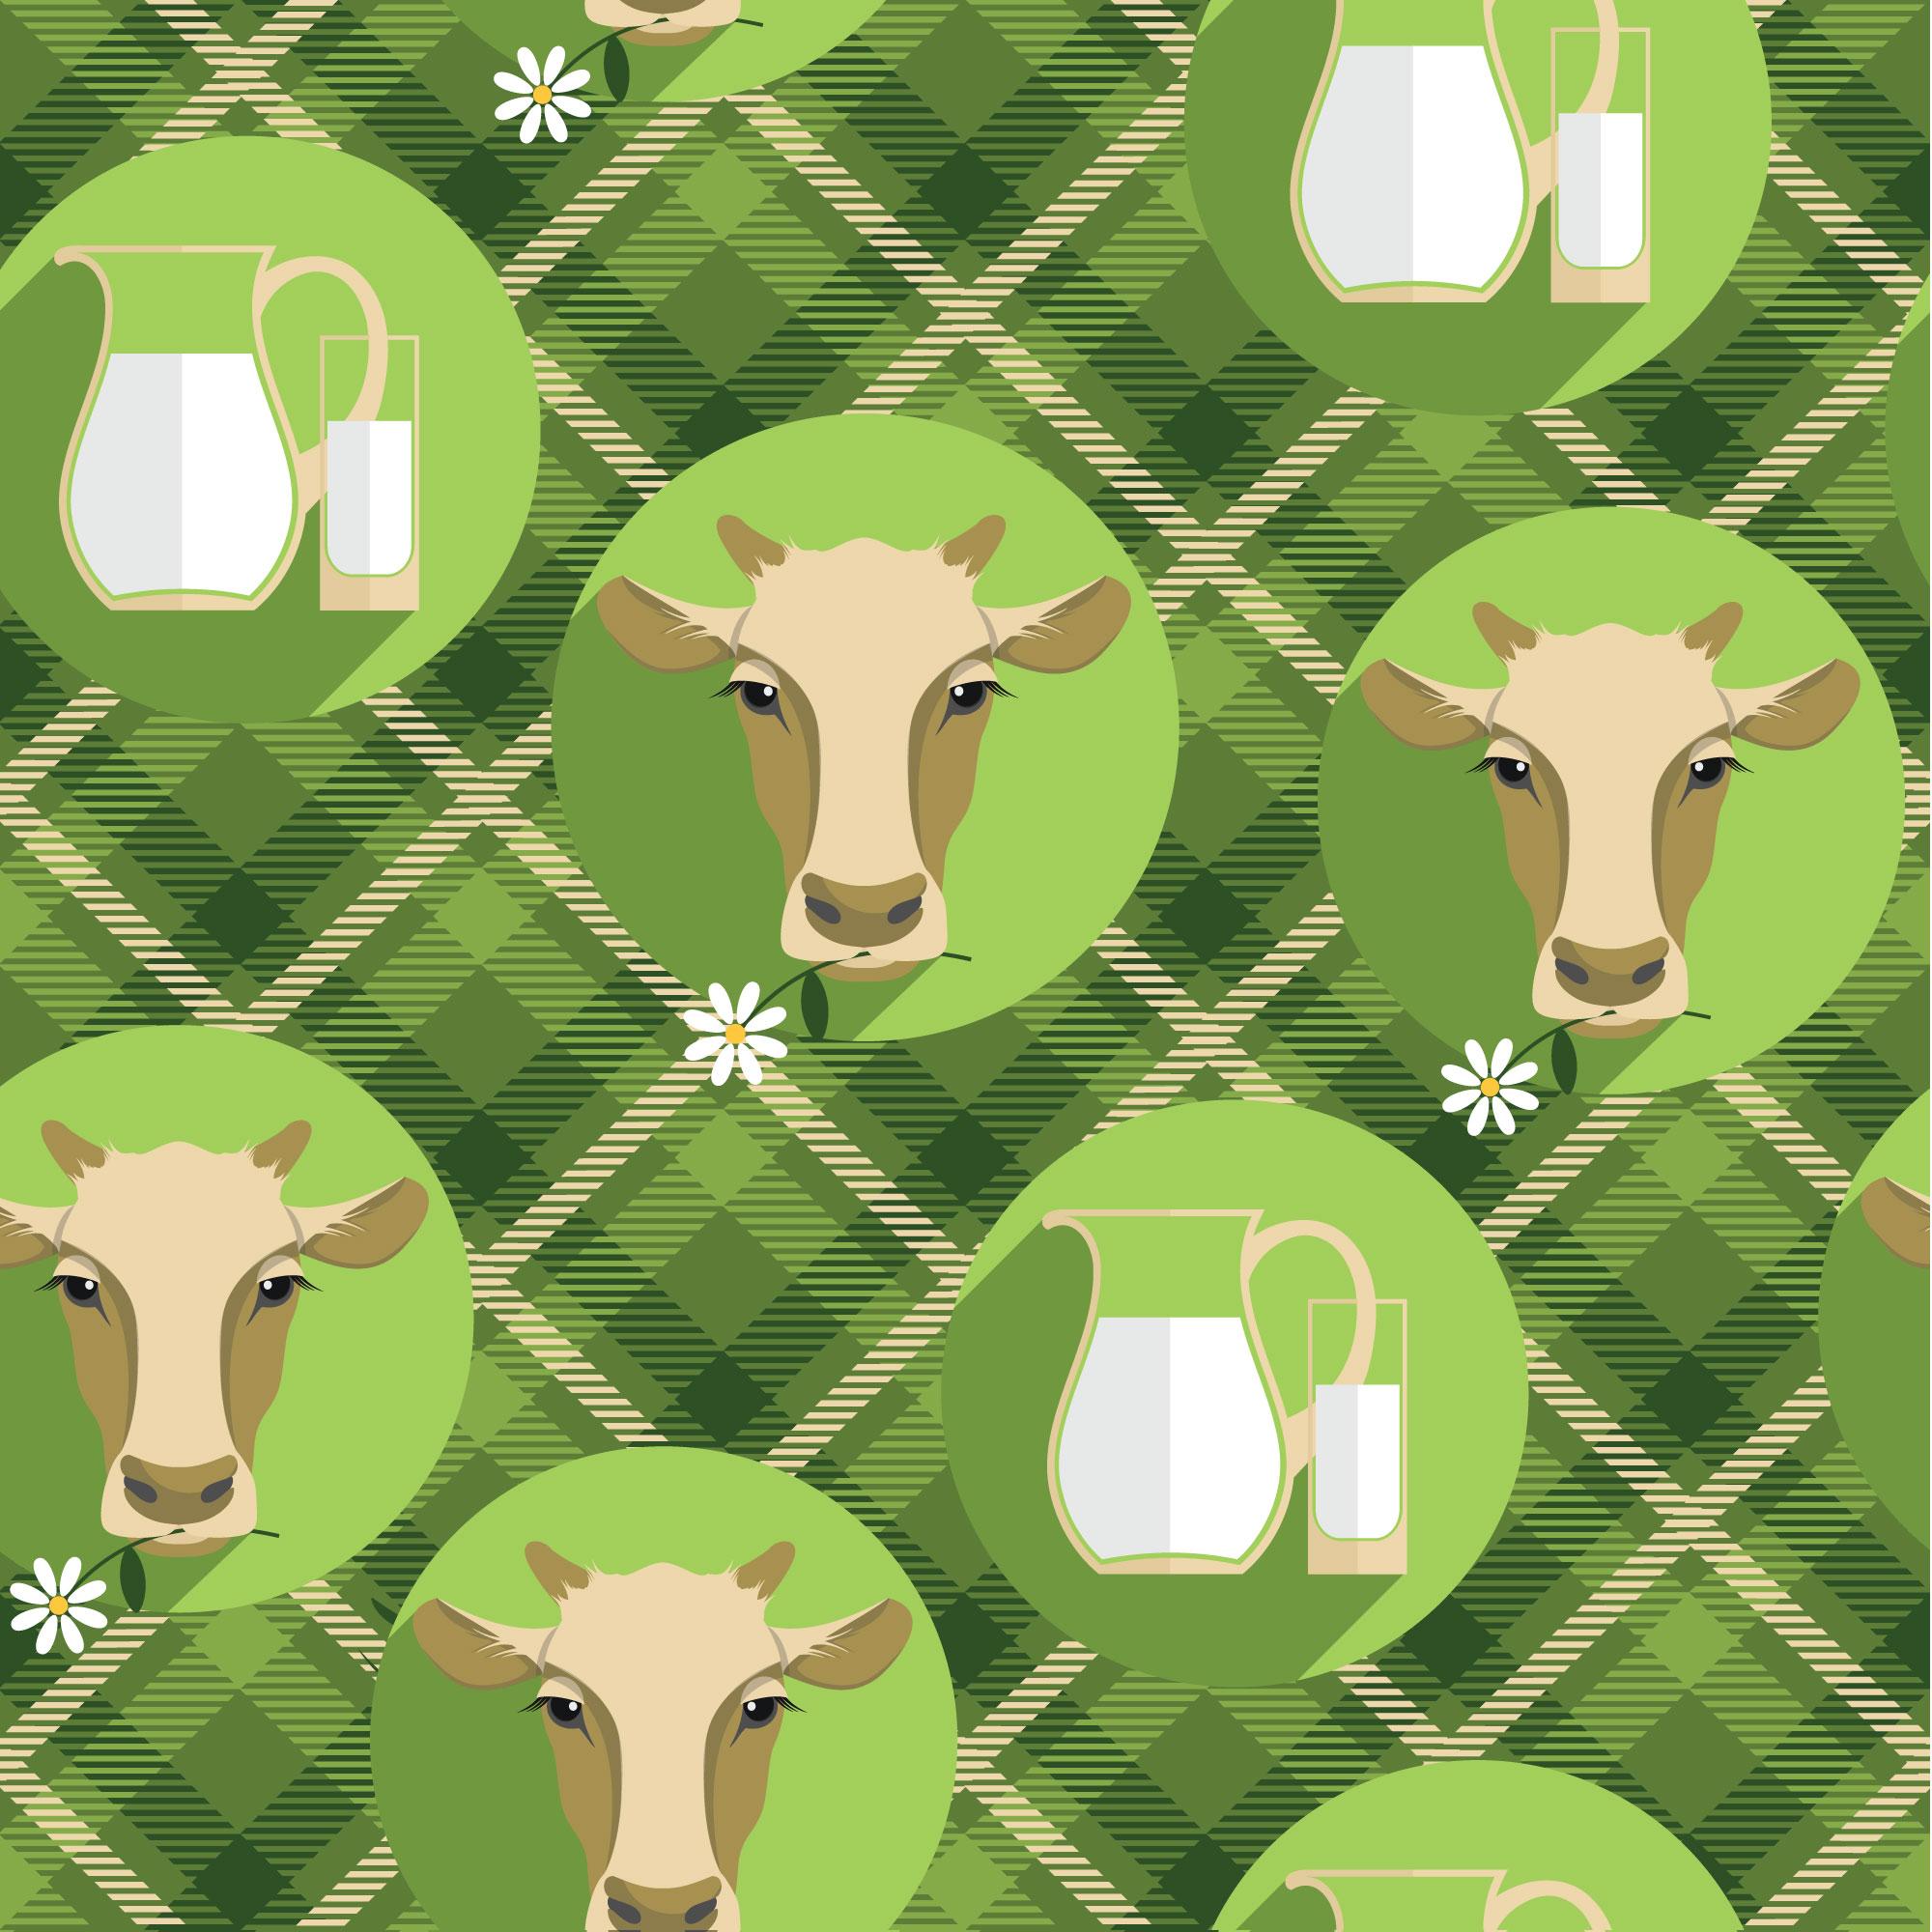 Vector  flat design illustration of cow. Seamless pattern Photoshop brush